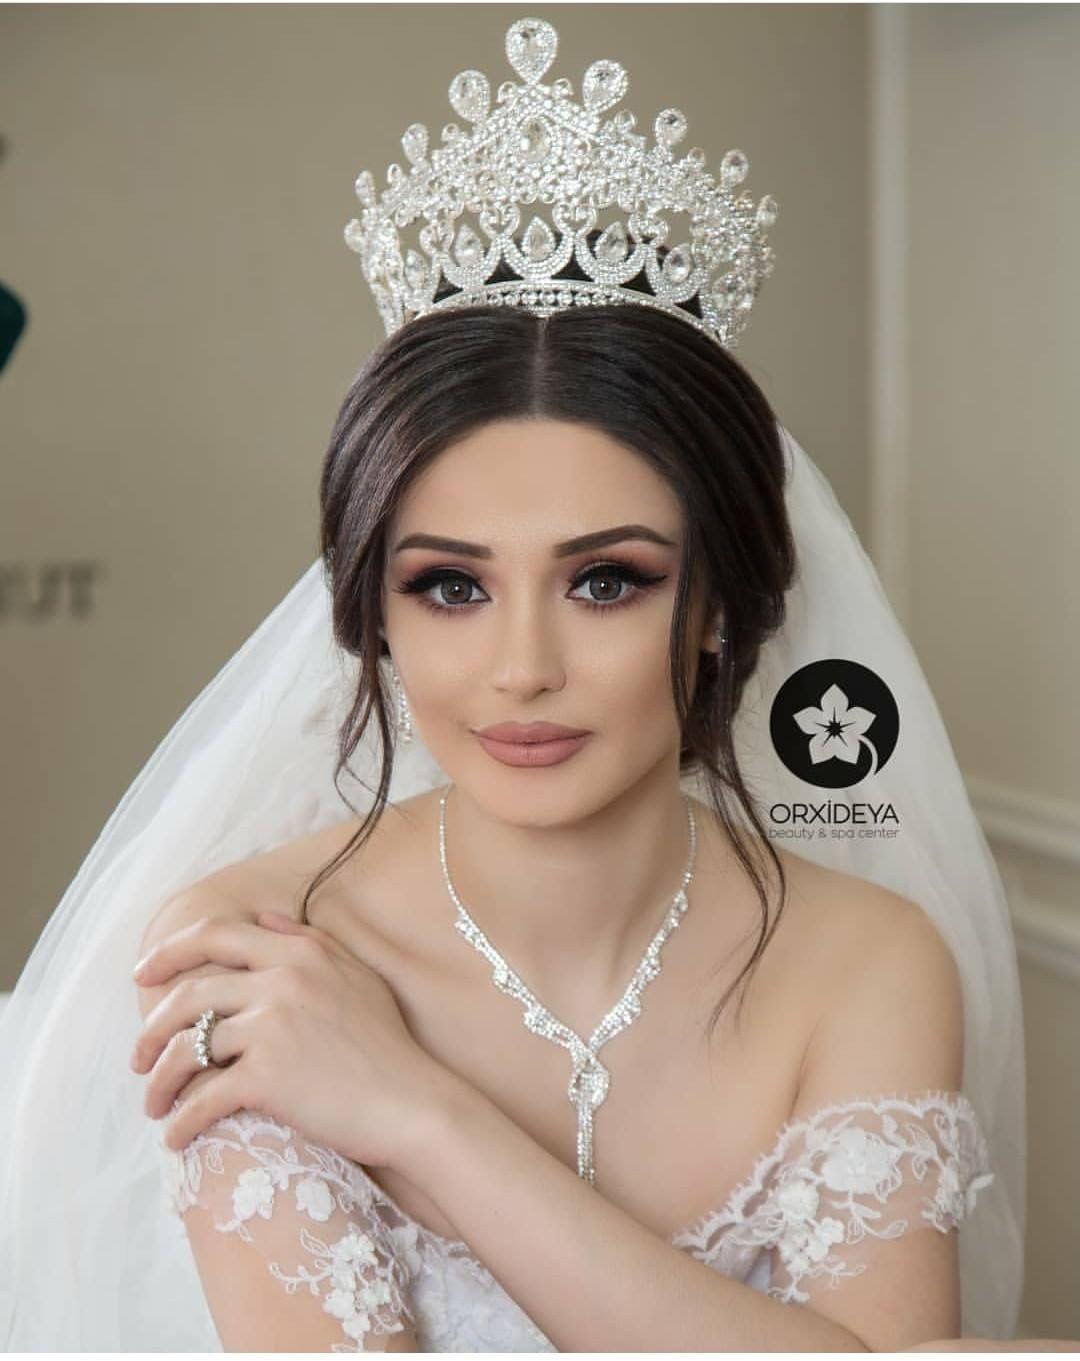 Pin By Siti Sopiah On Elegance Bridal Hair And Makeup Wedding Hair And Makeup Bridal Makeup